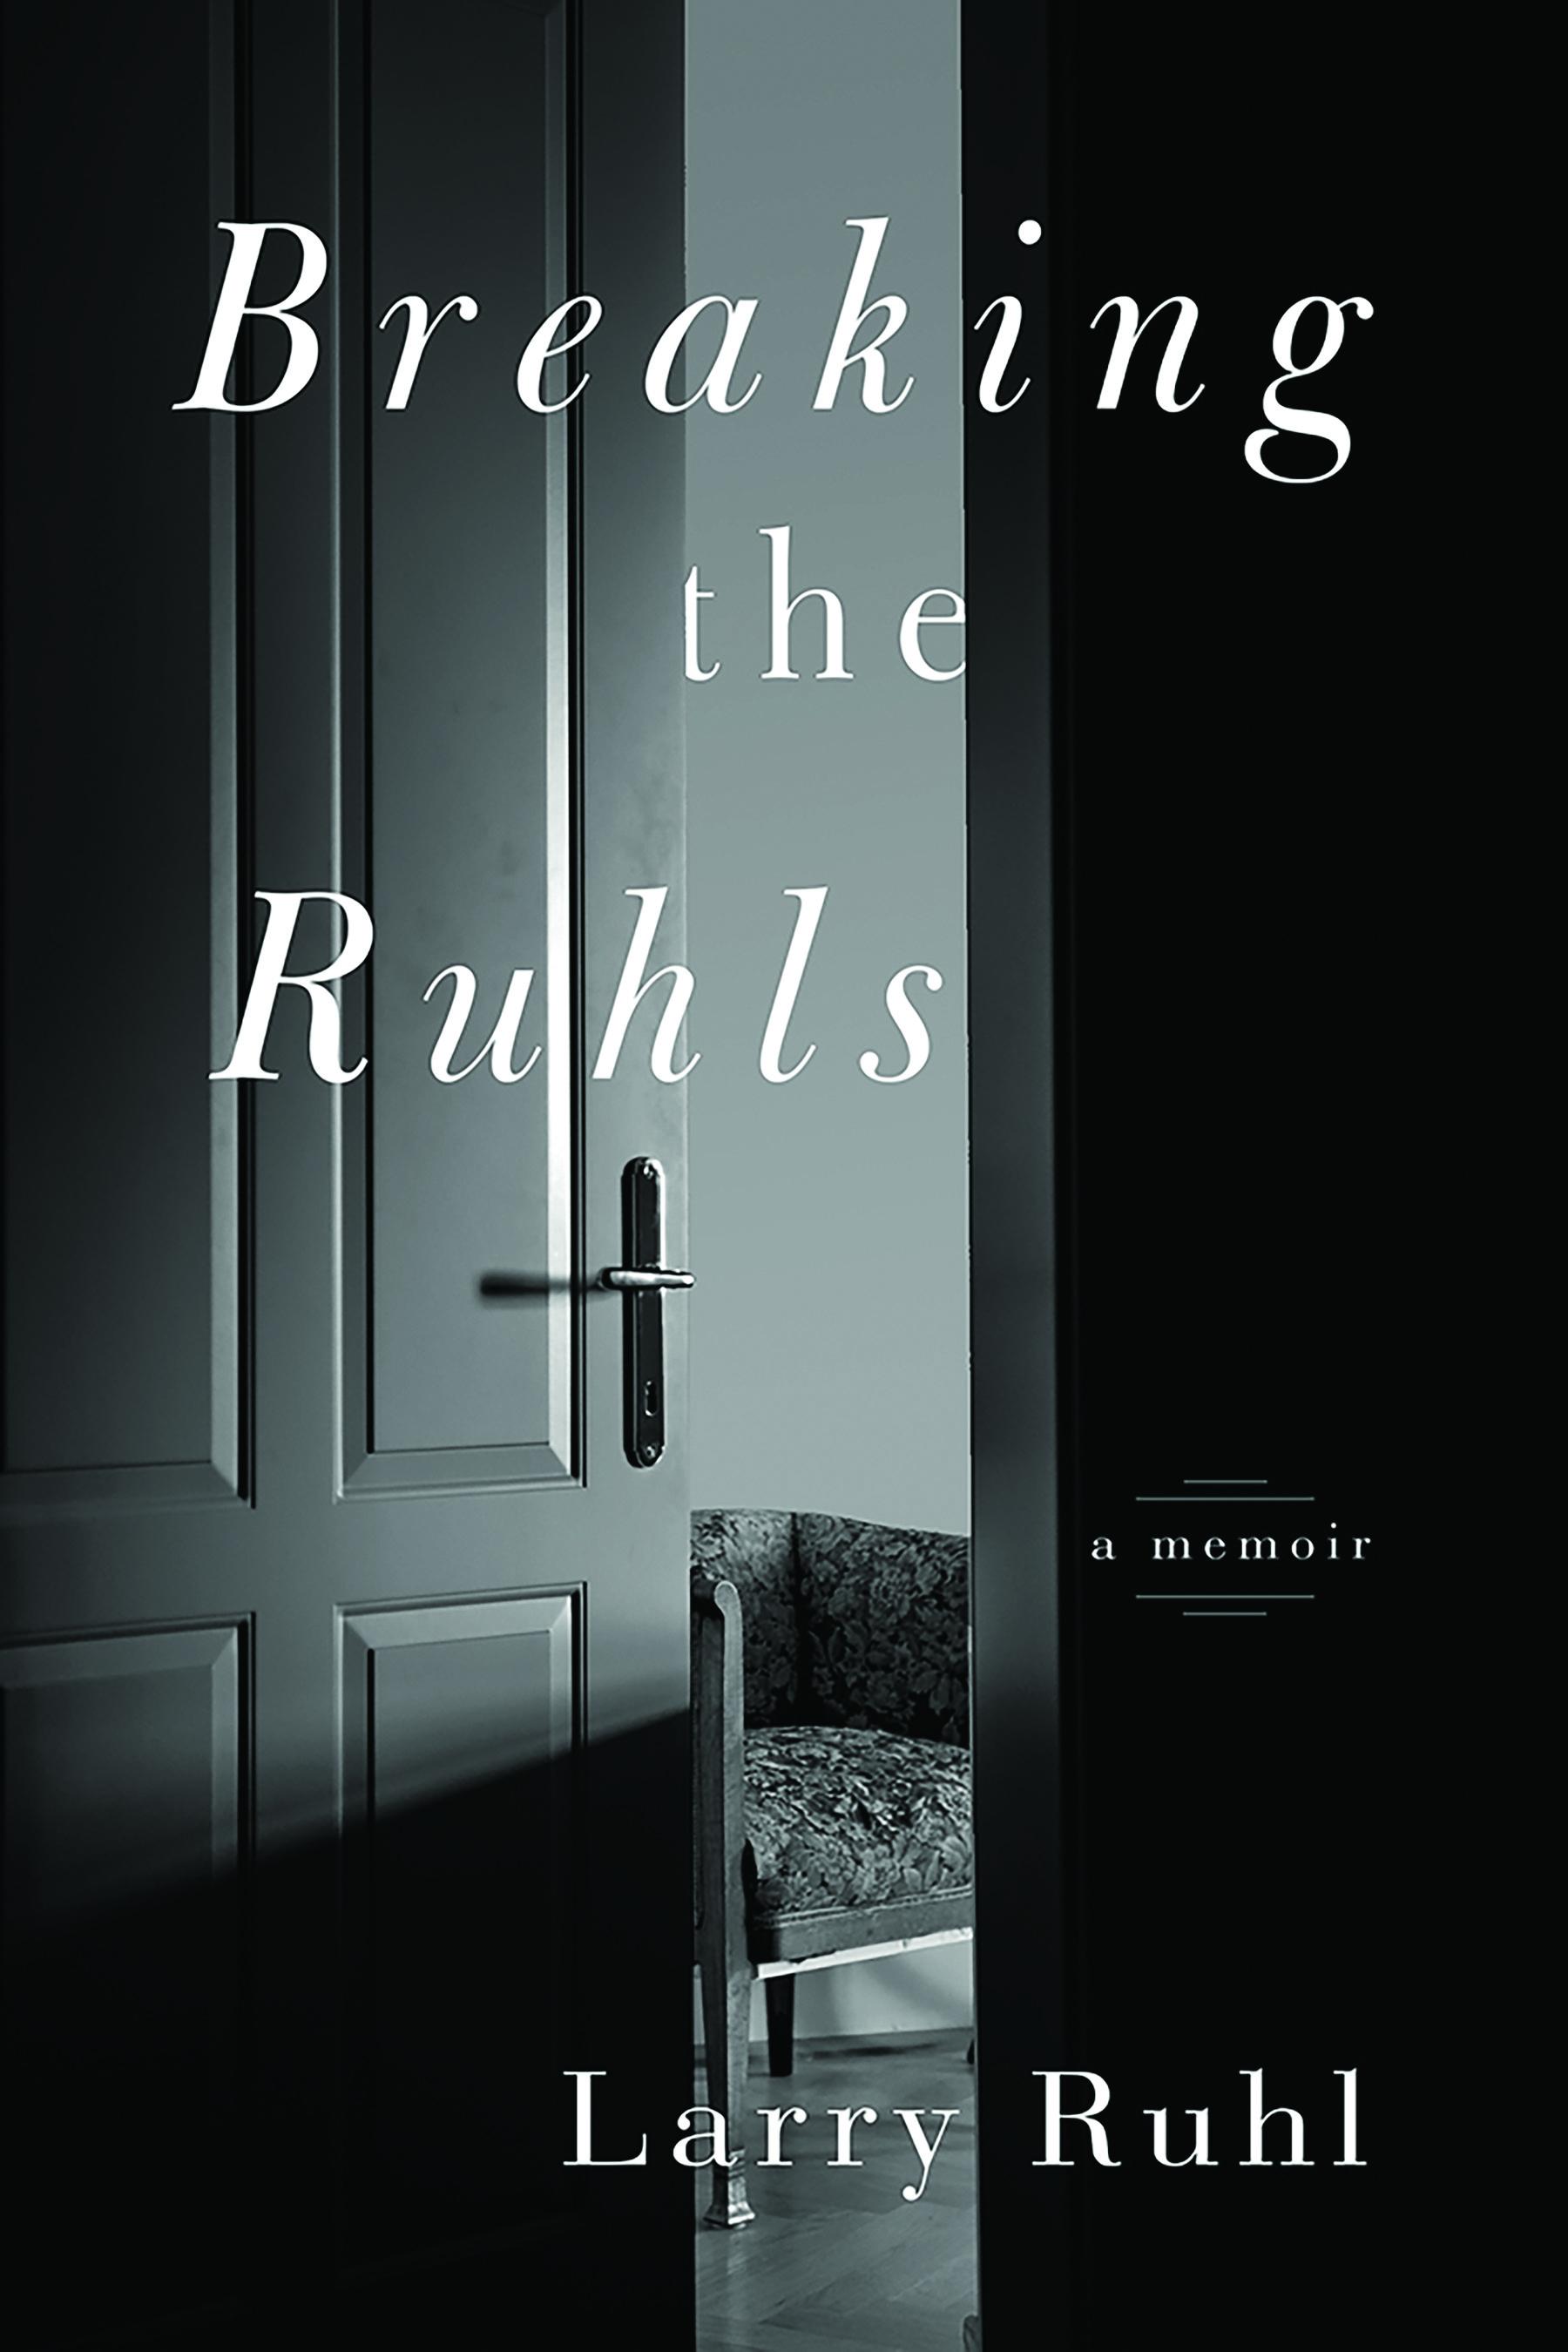 breaking-the-ruhls_front-cover.jpg